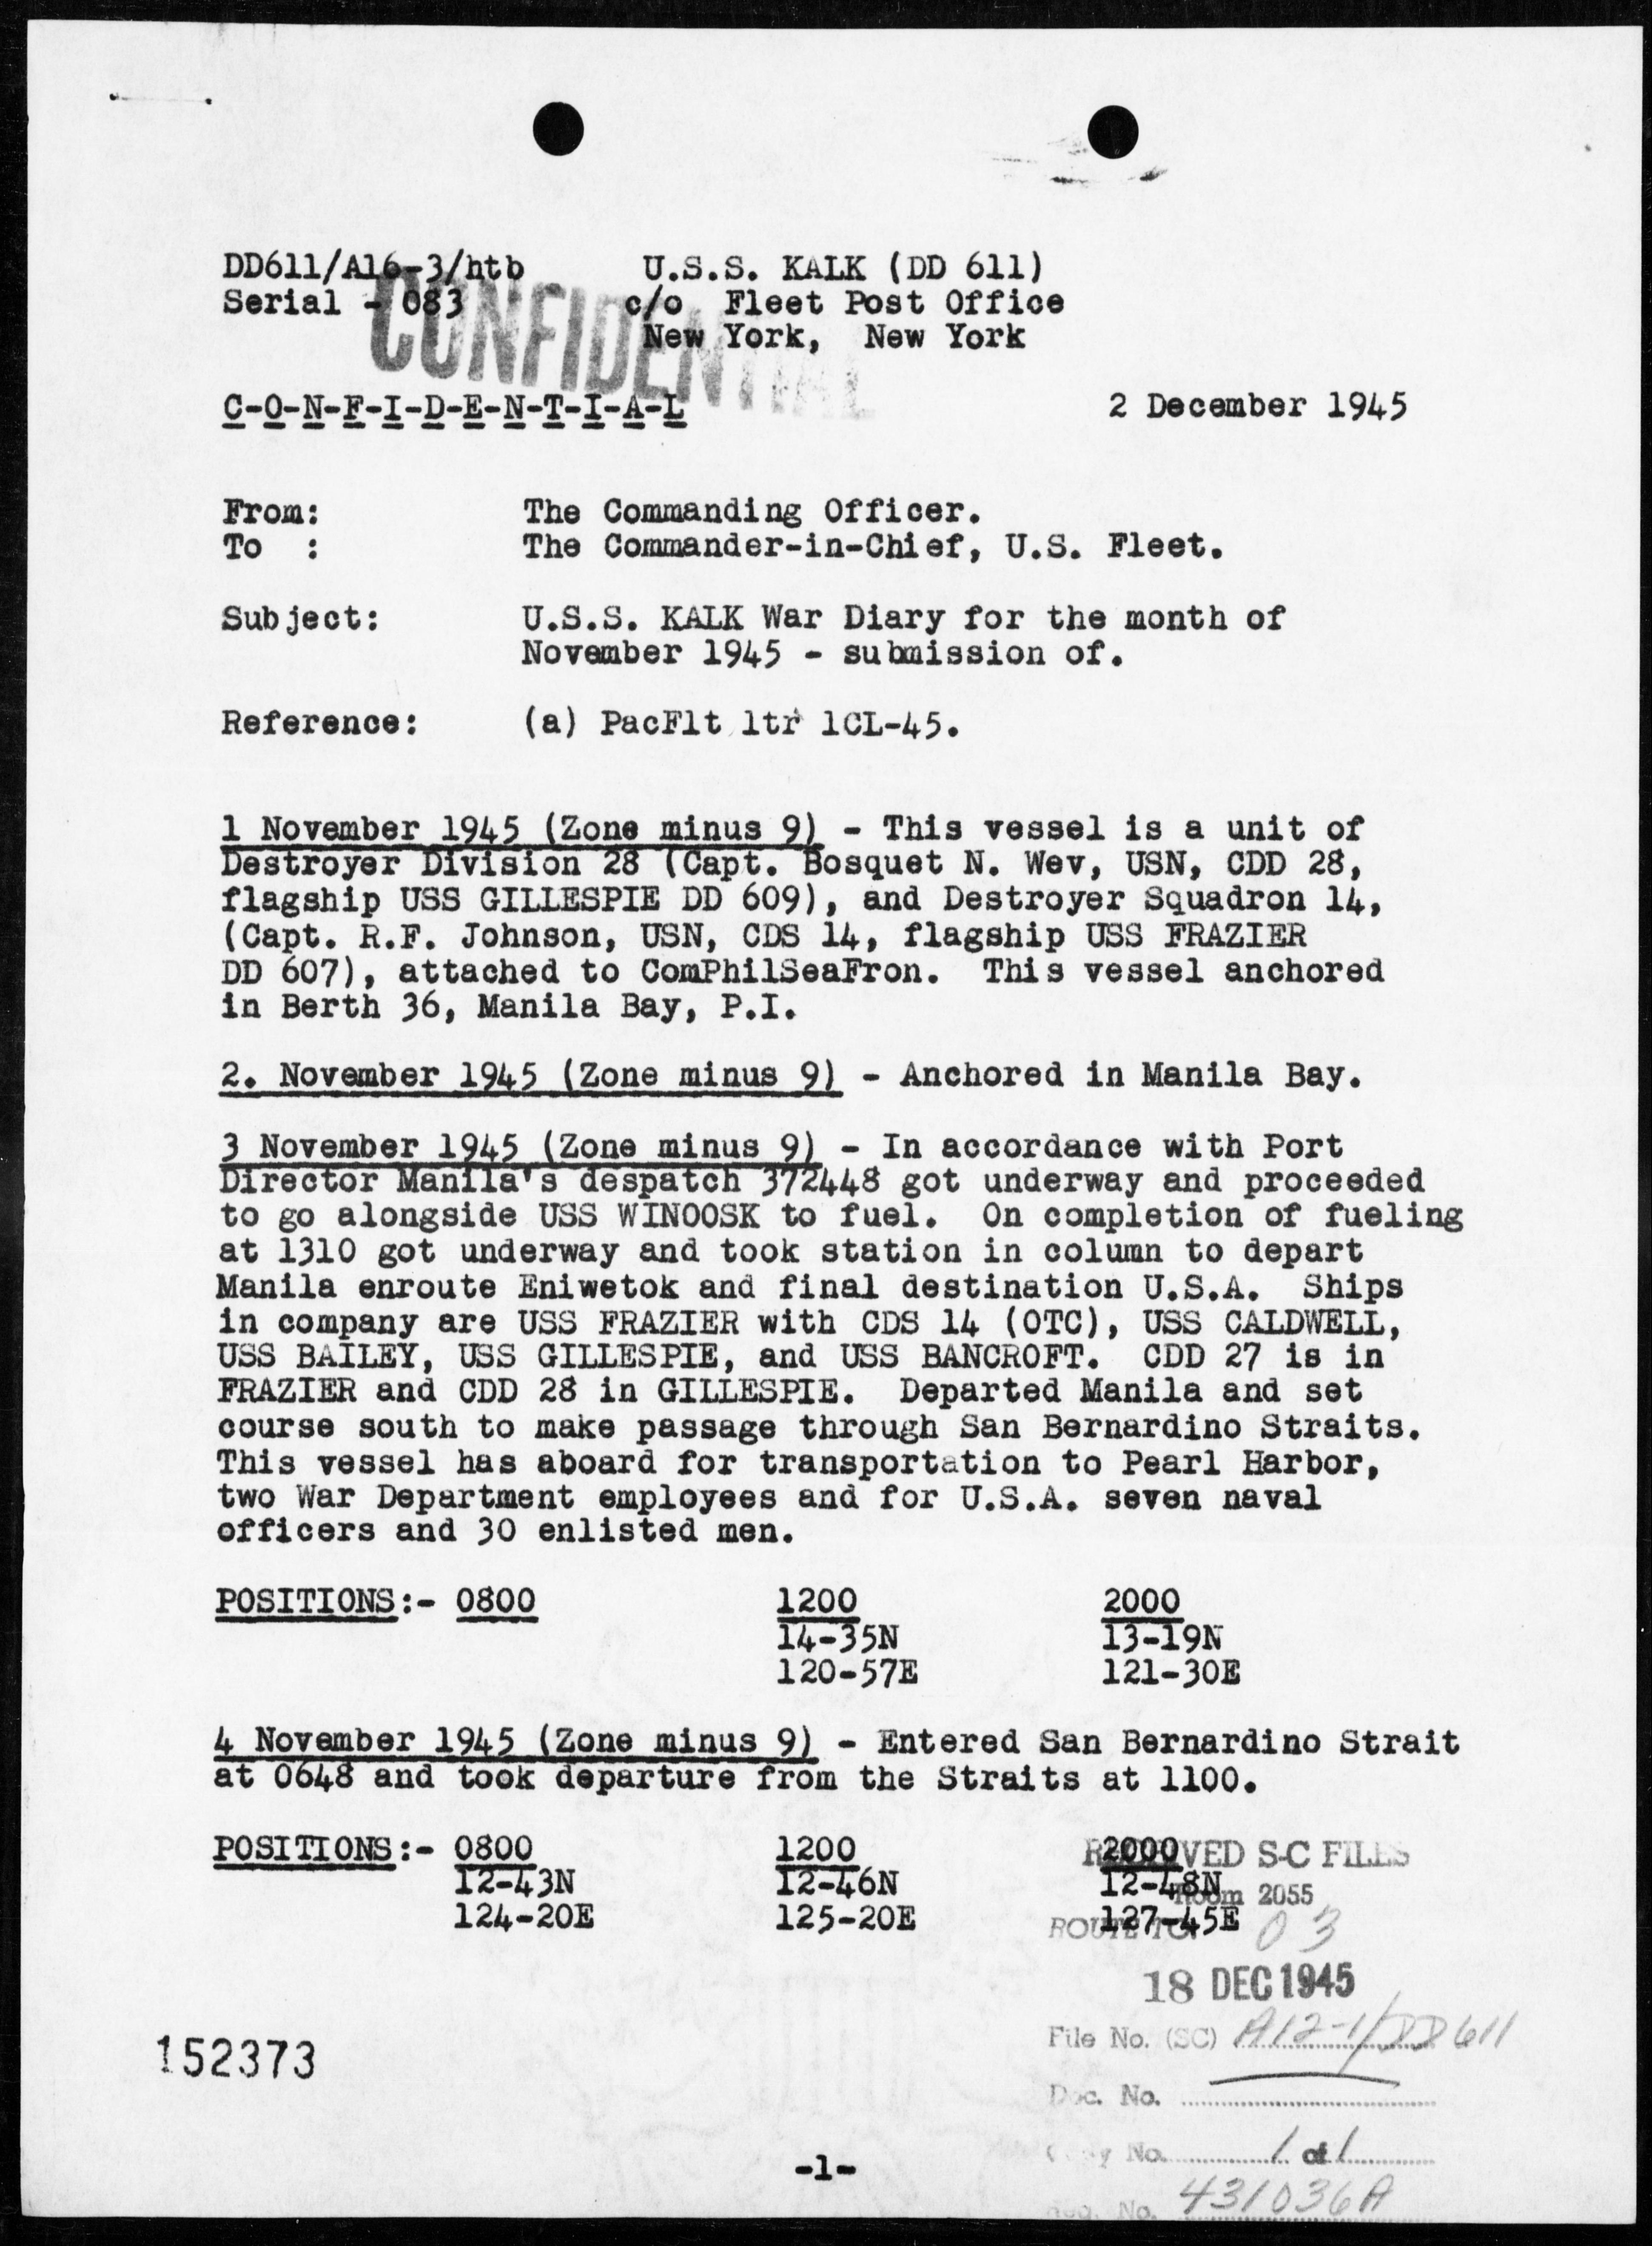 USS KALK - War Diary, 11/1-30/45